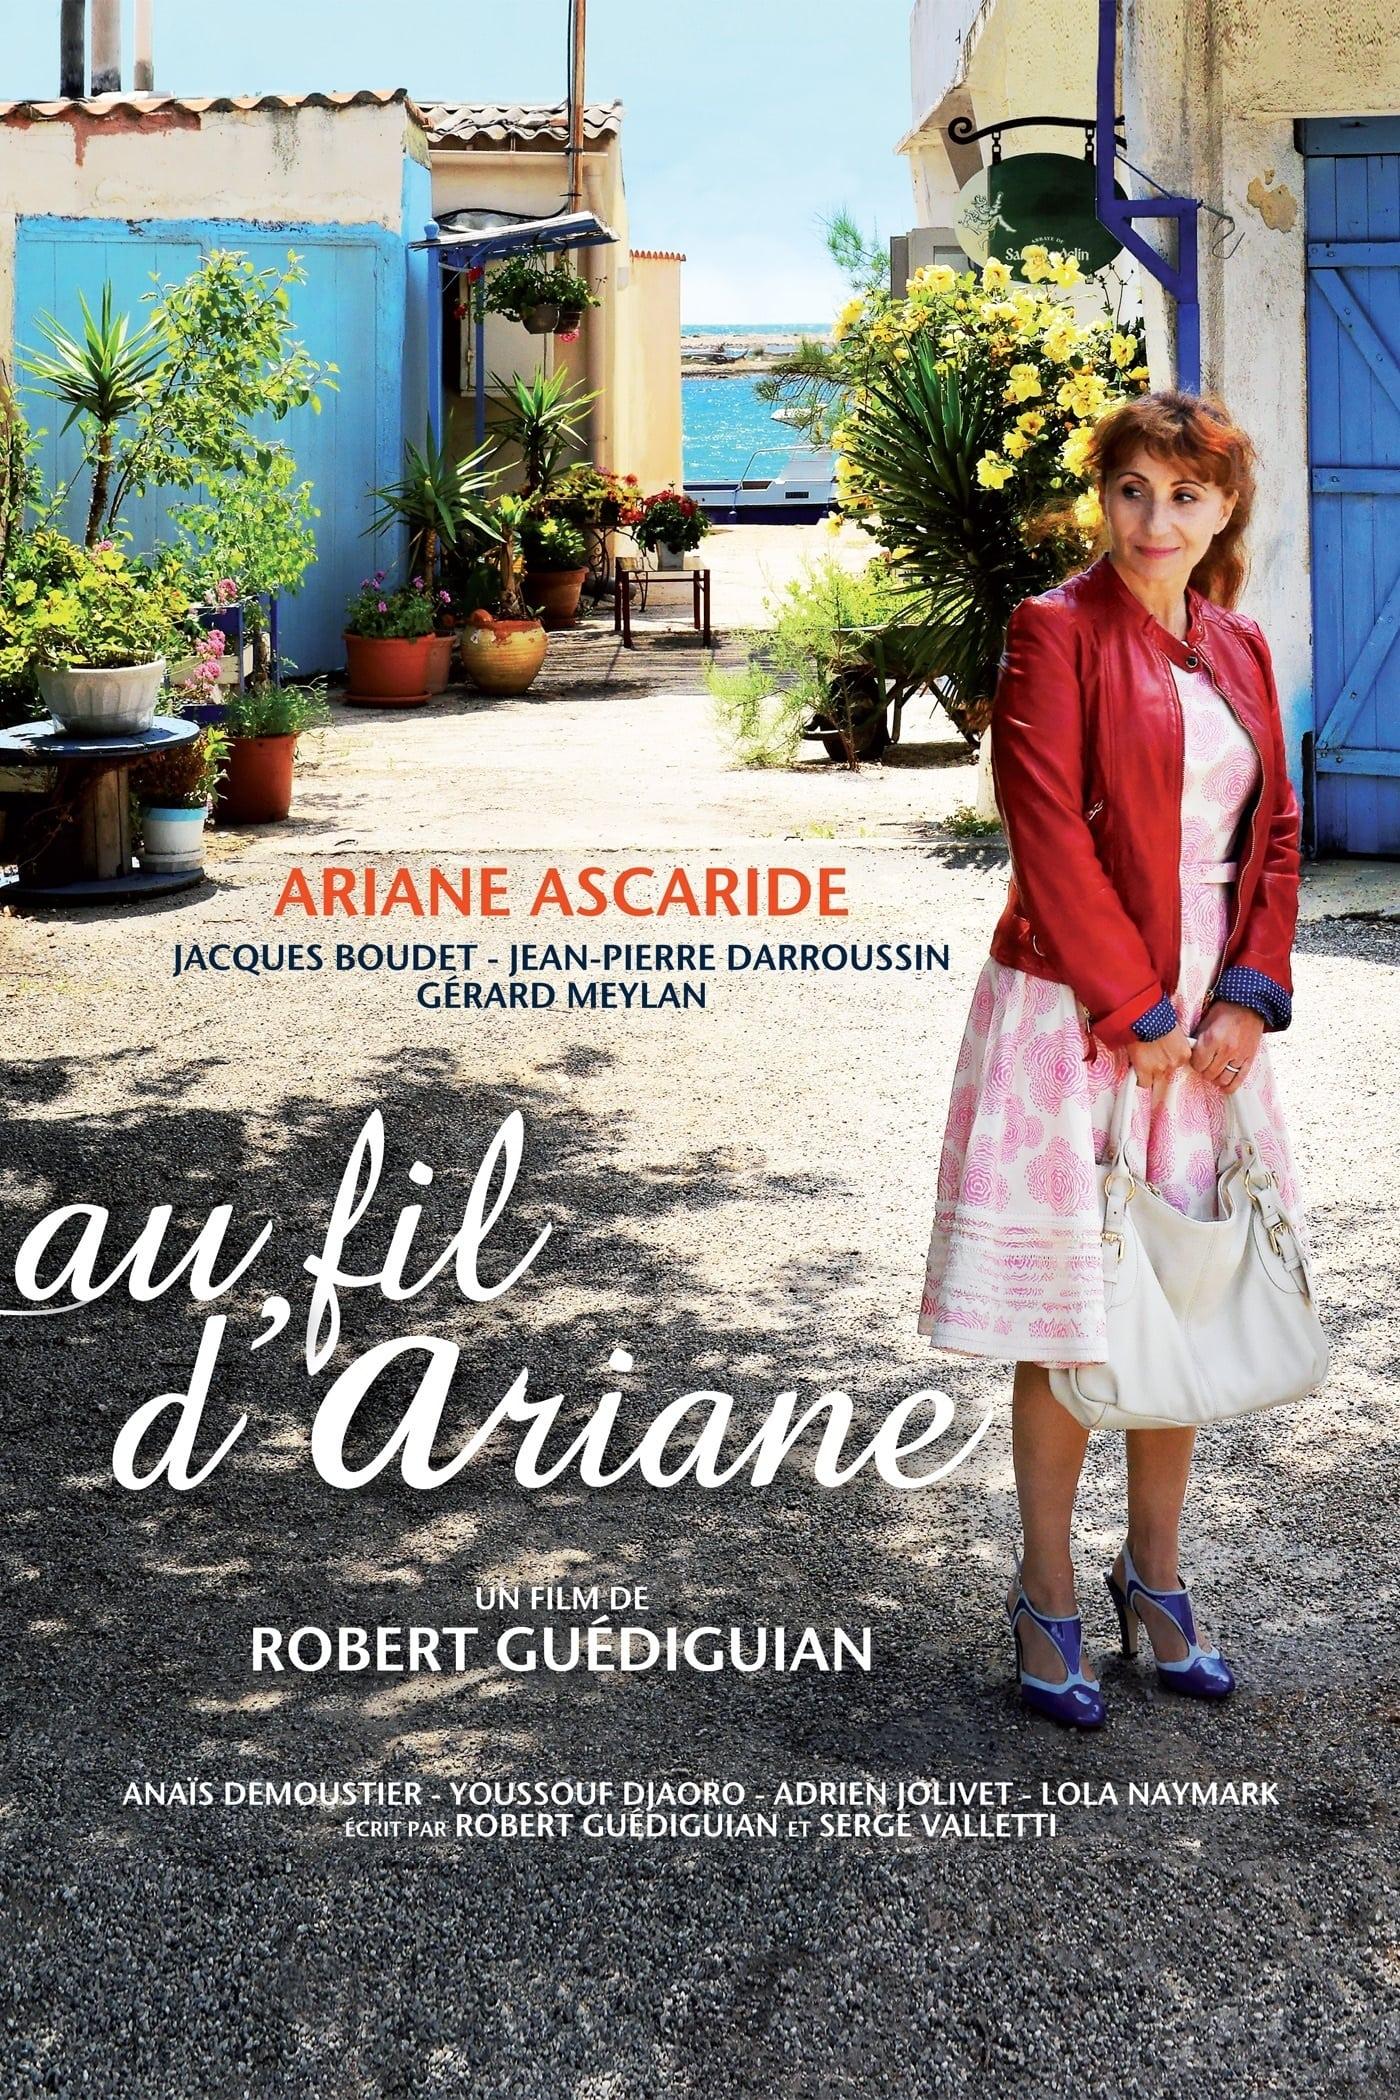 O Fio de Ariane